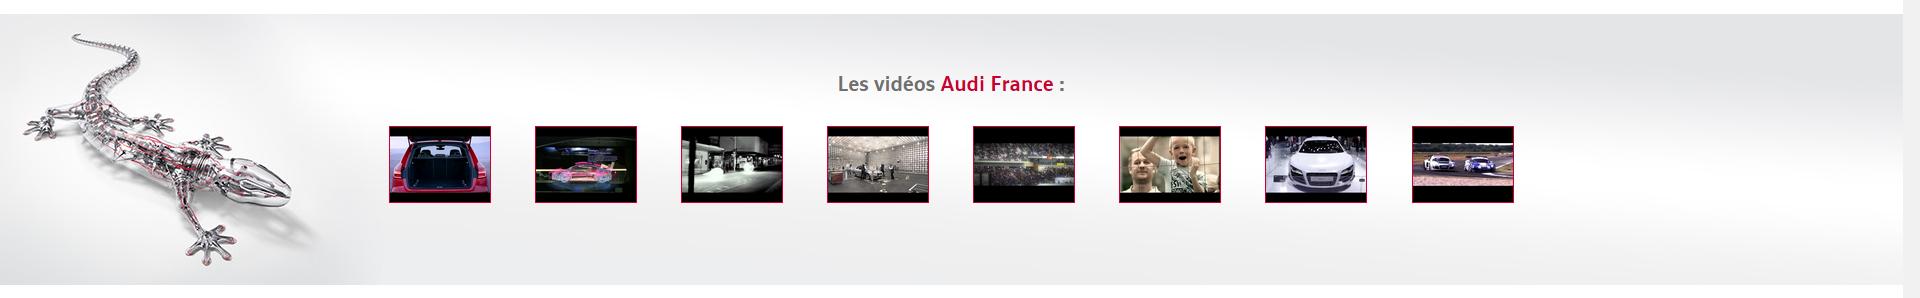 videowall-audi.png